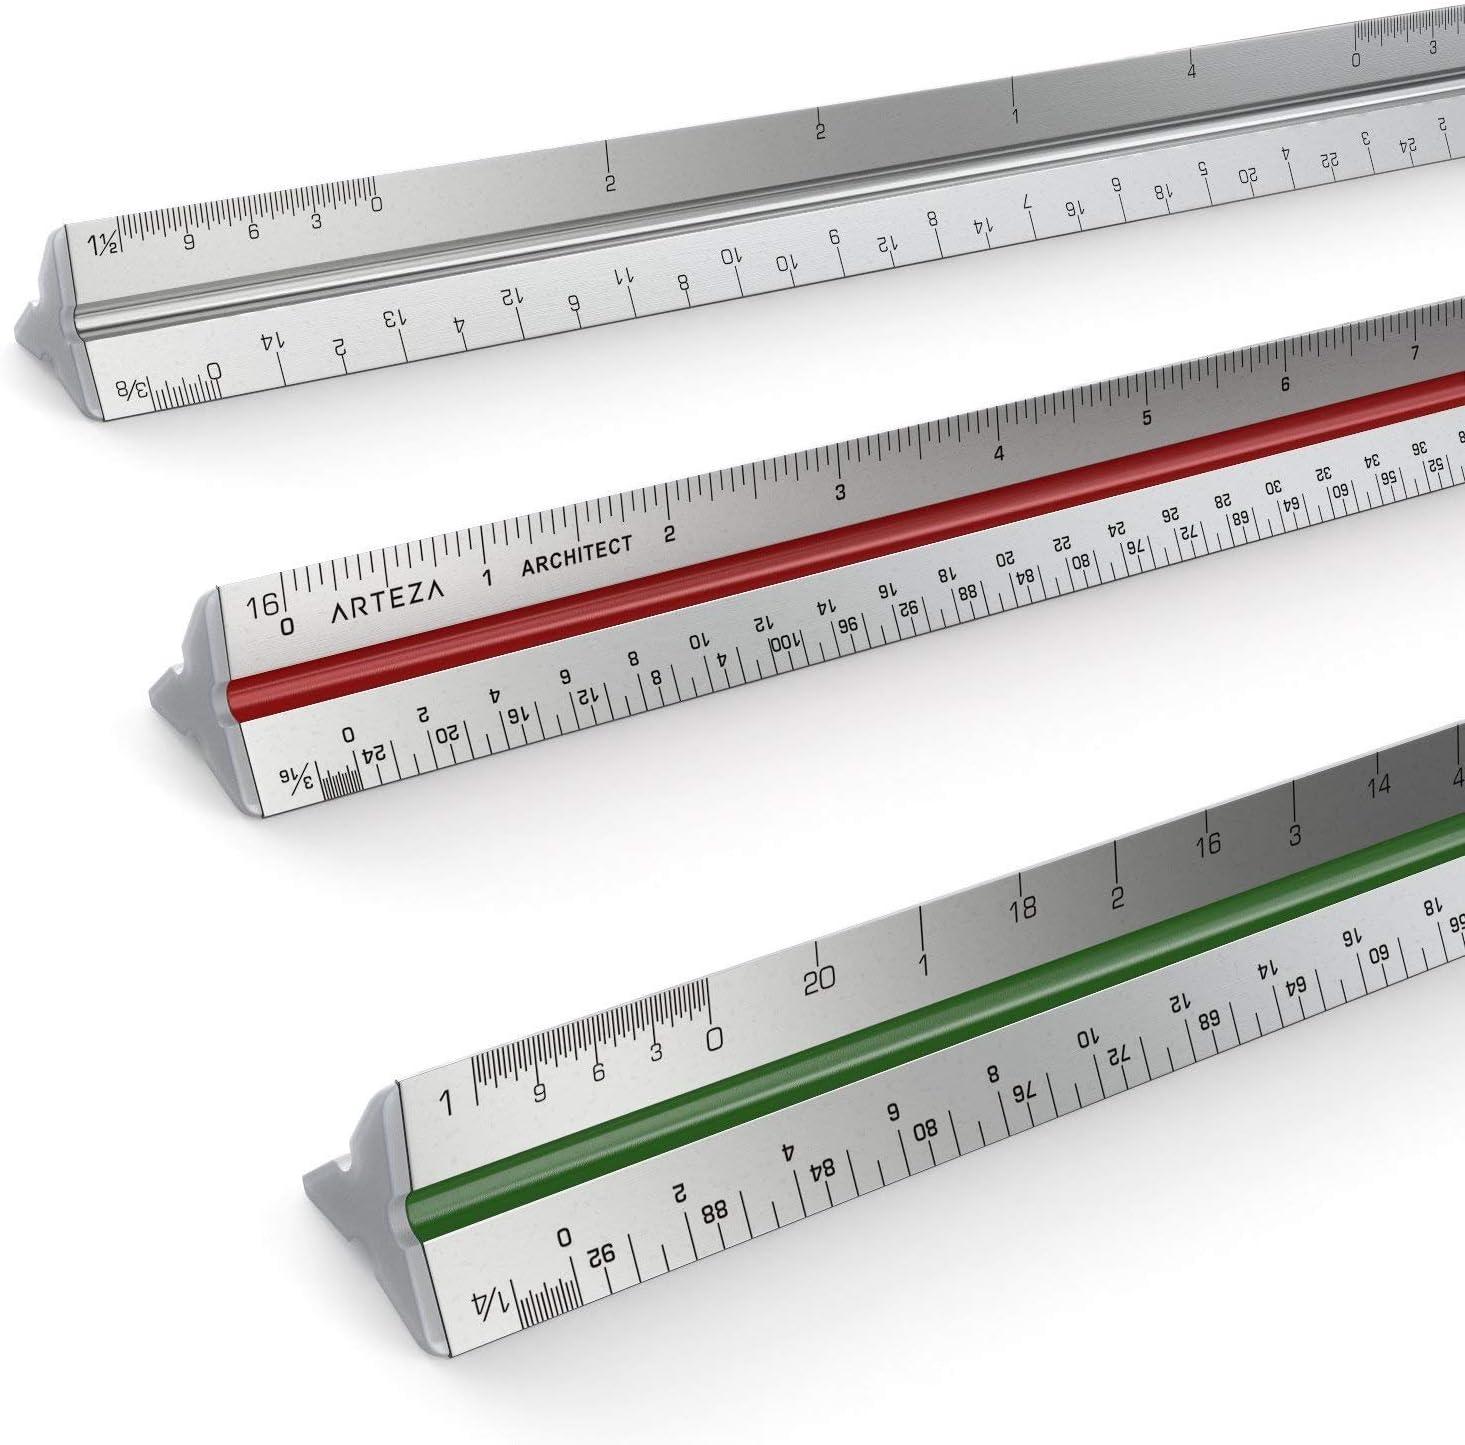 Regla 30 cm Ranuras codificadas aluminio escala de arquitec